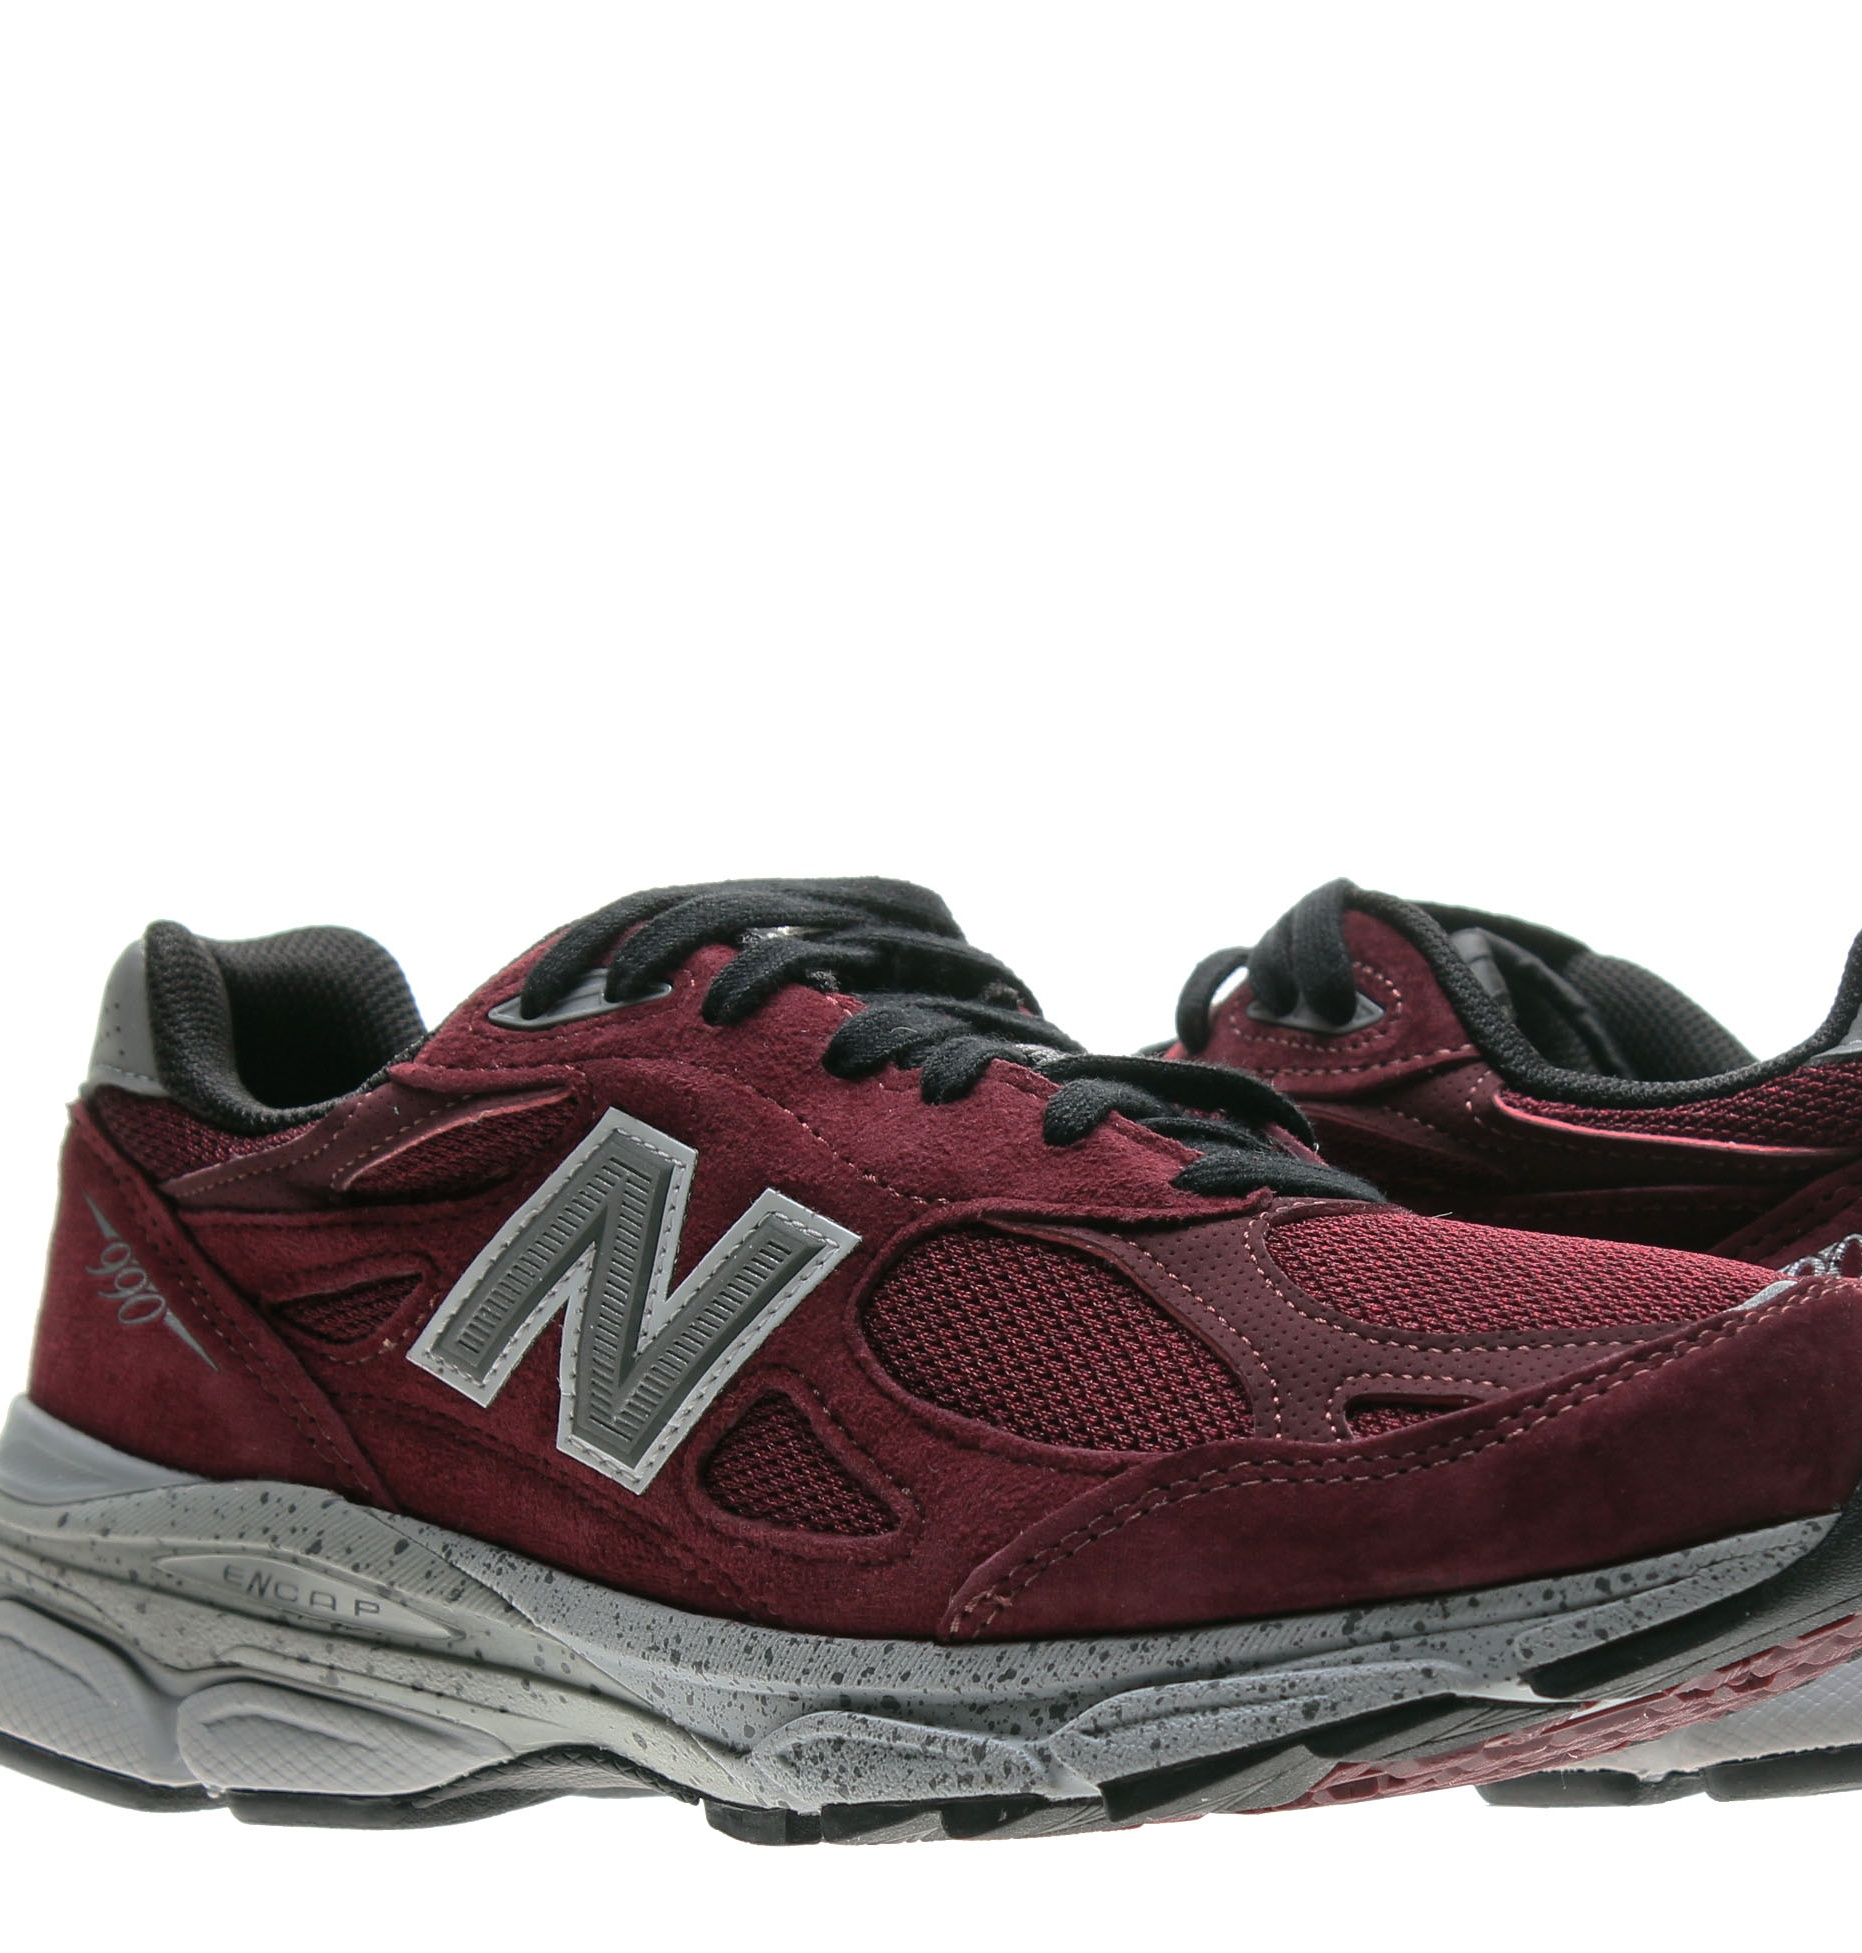 New Balance 990v3 Burgundy Grey Men's Running Shoes M990BU3 by